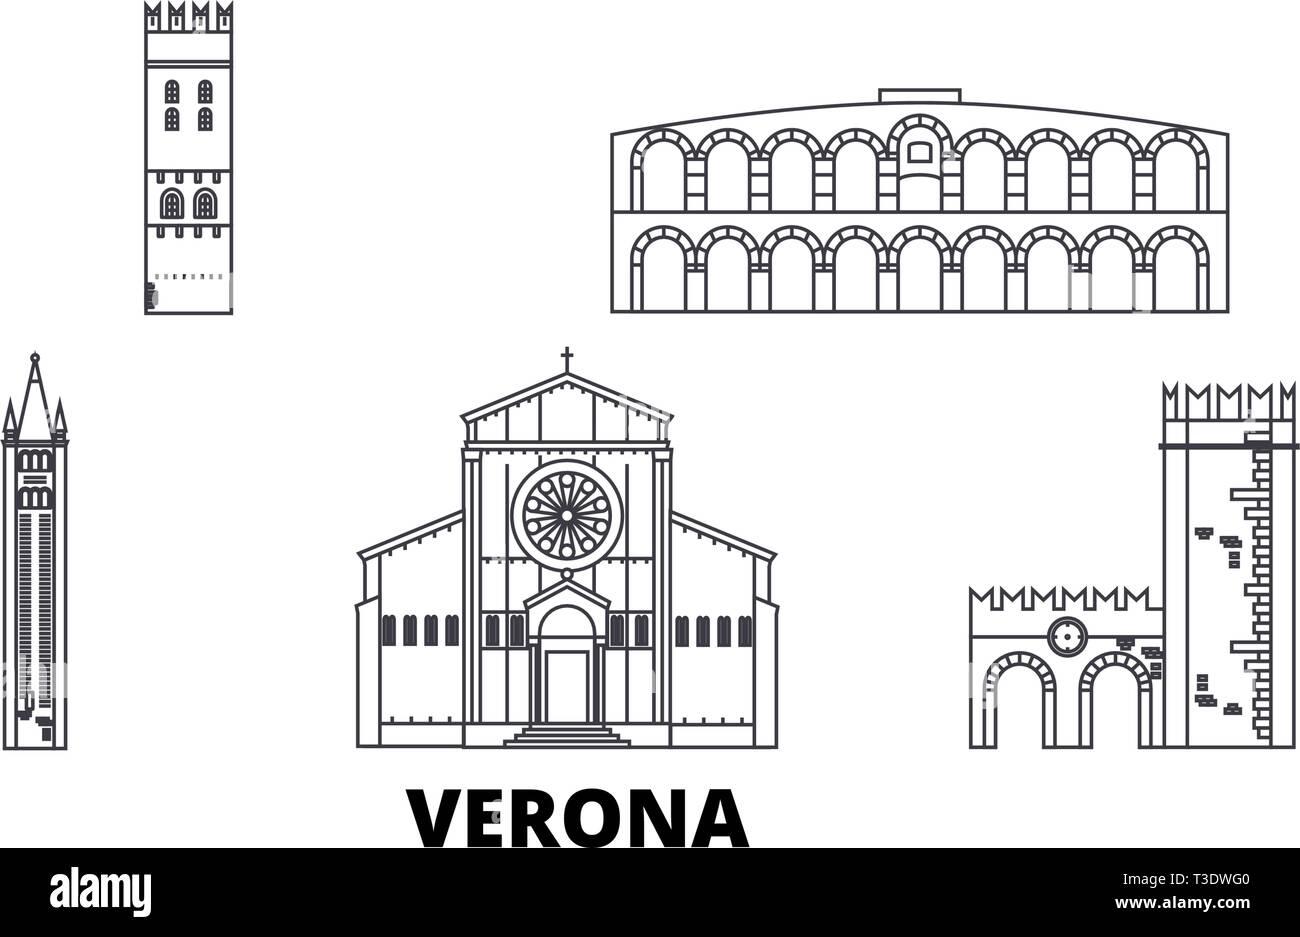 Italy, Verona line travel skyline set. Italy, Verona outline city vector illustration, symbol, travel sights, landmarks. - Stock Vector